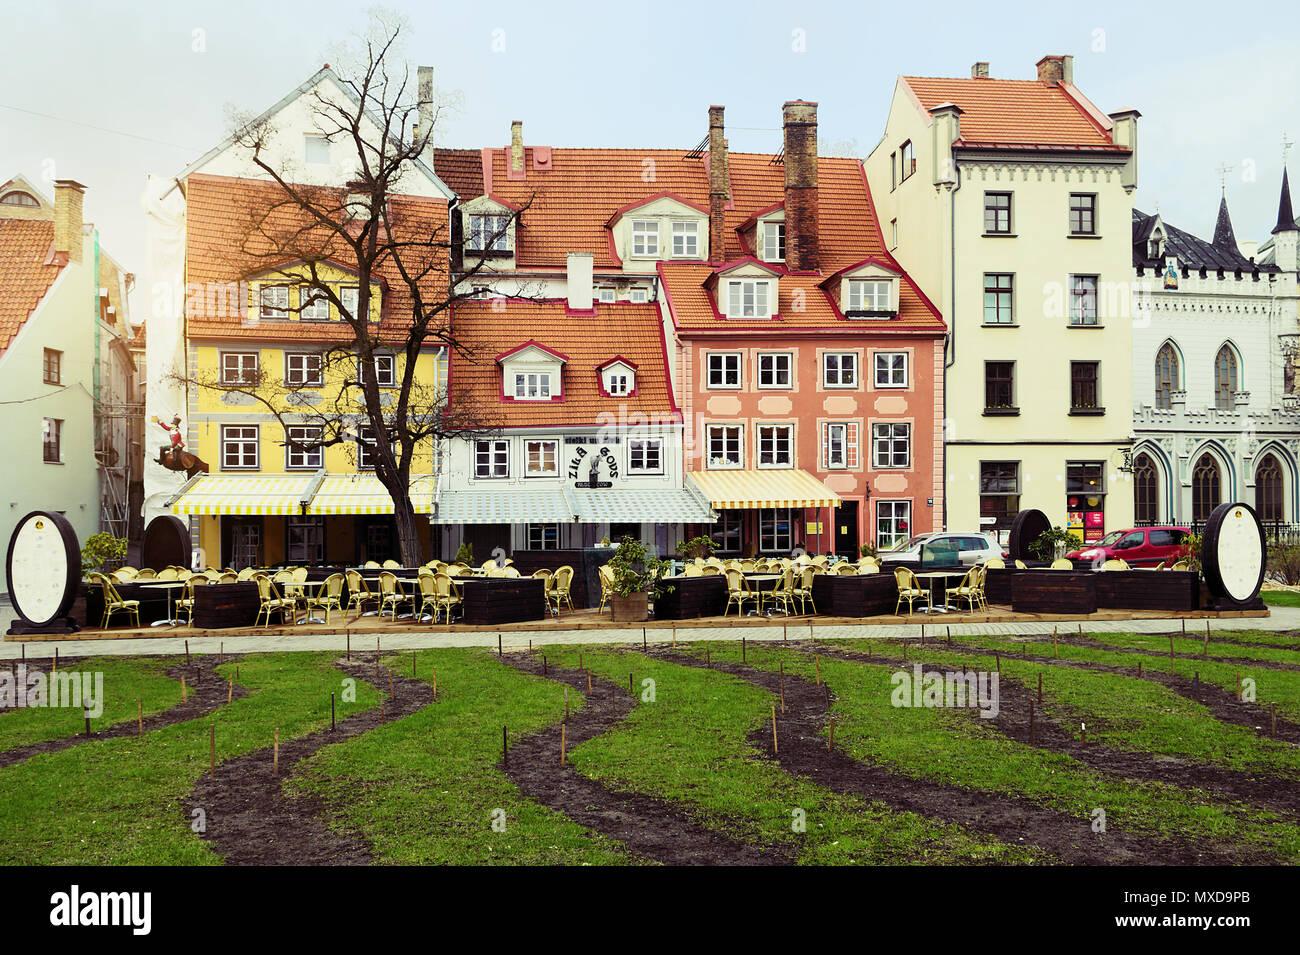 Riga, Latvia. Livu laukums square with colorful townhouses on Meistaru iela street. Old town of Riga. - Stock Image